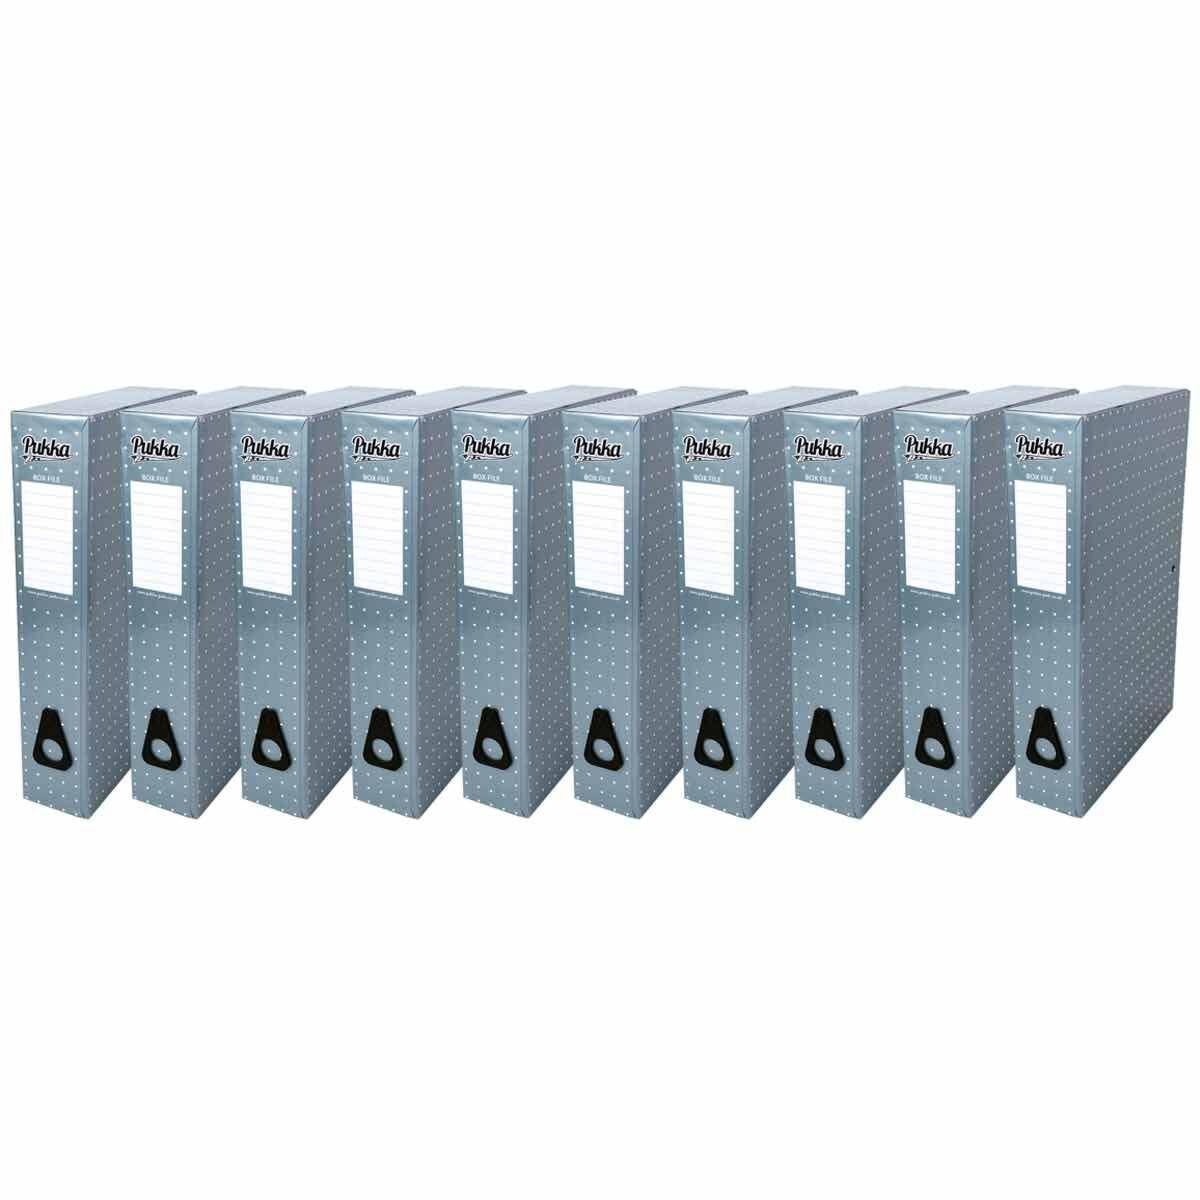 Pukka Metallic Foolscap Box File Pack of 10 Metallic Blue